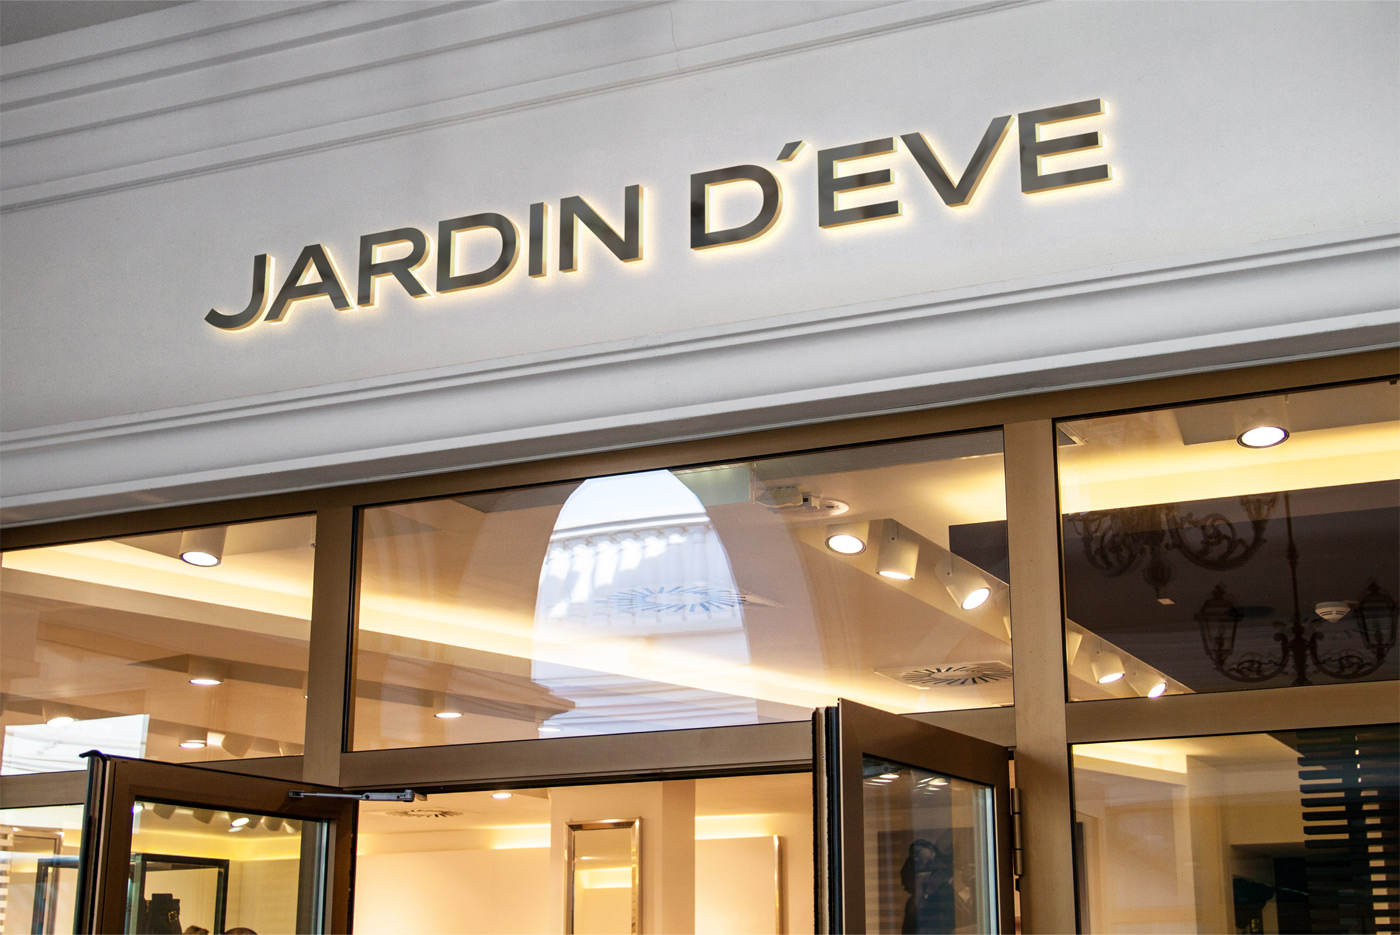 Дизайн логотипа на фасаде бренда Jardin d'Eve